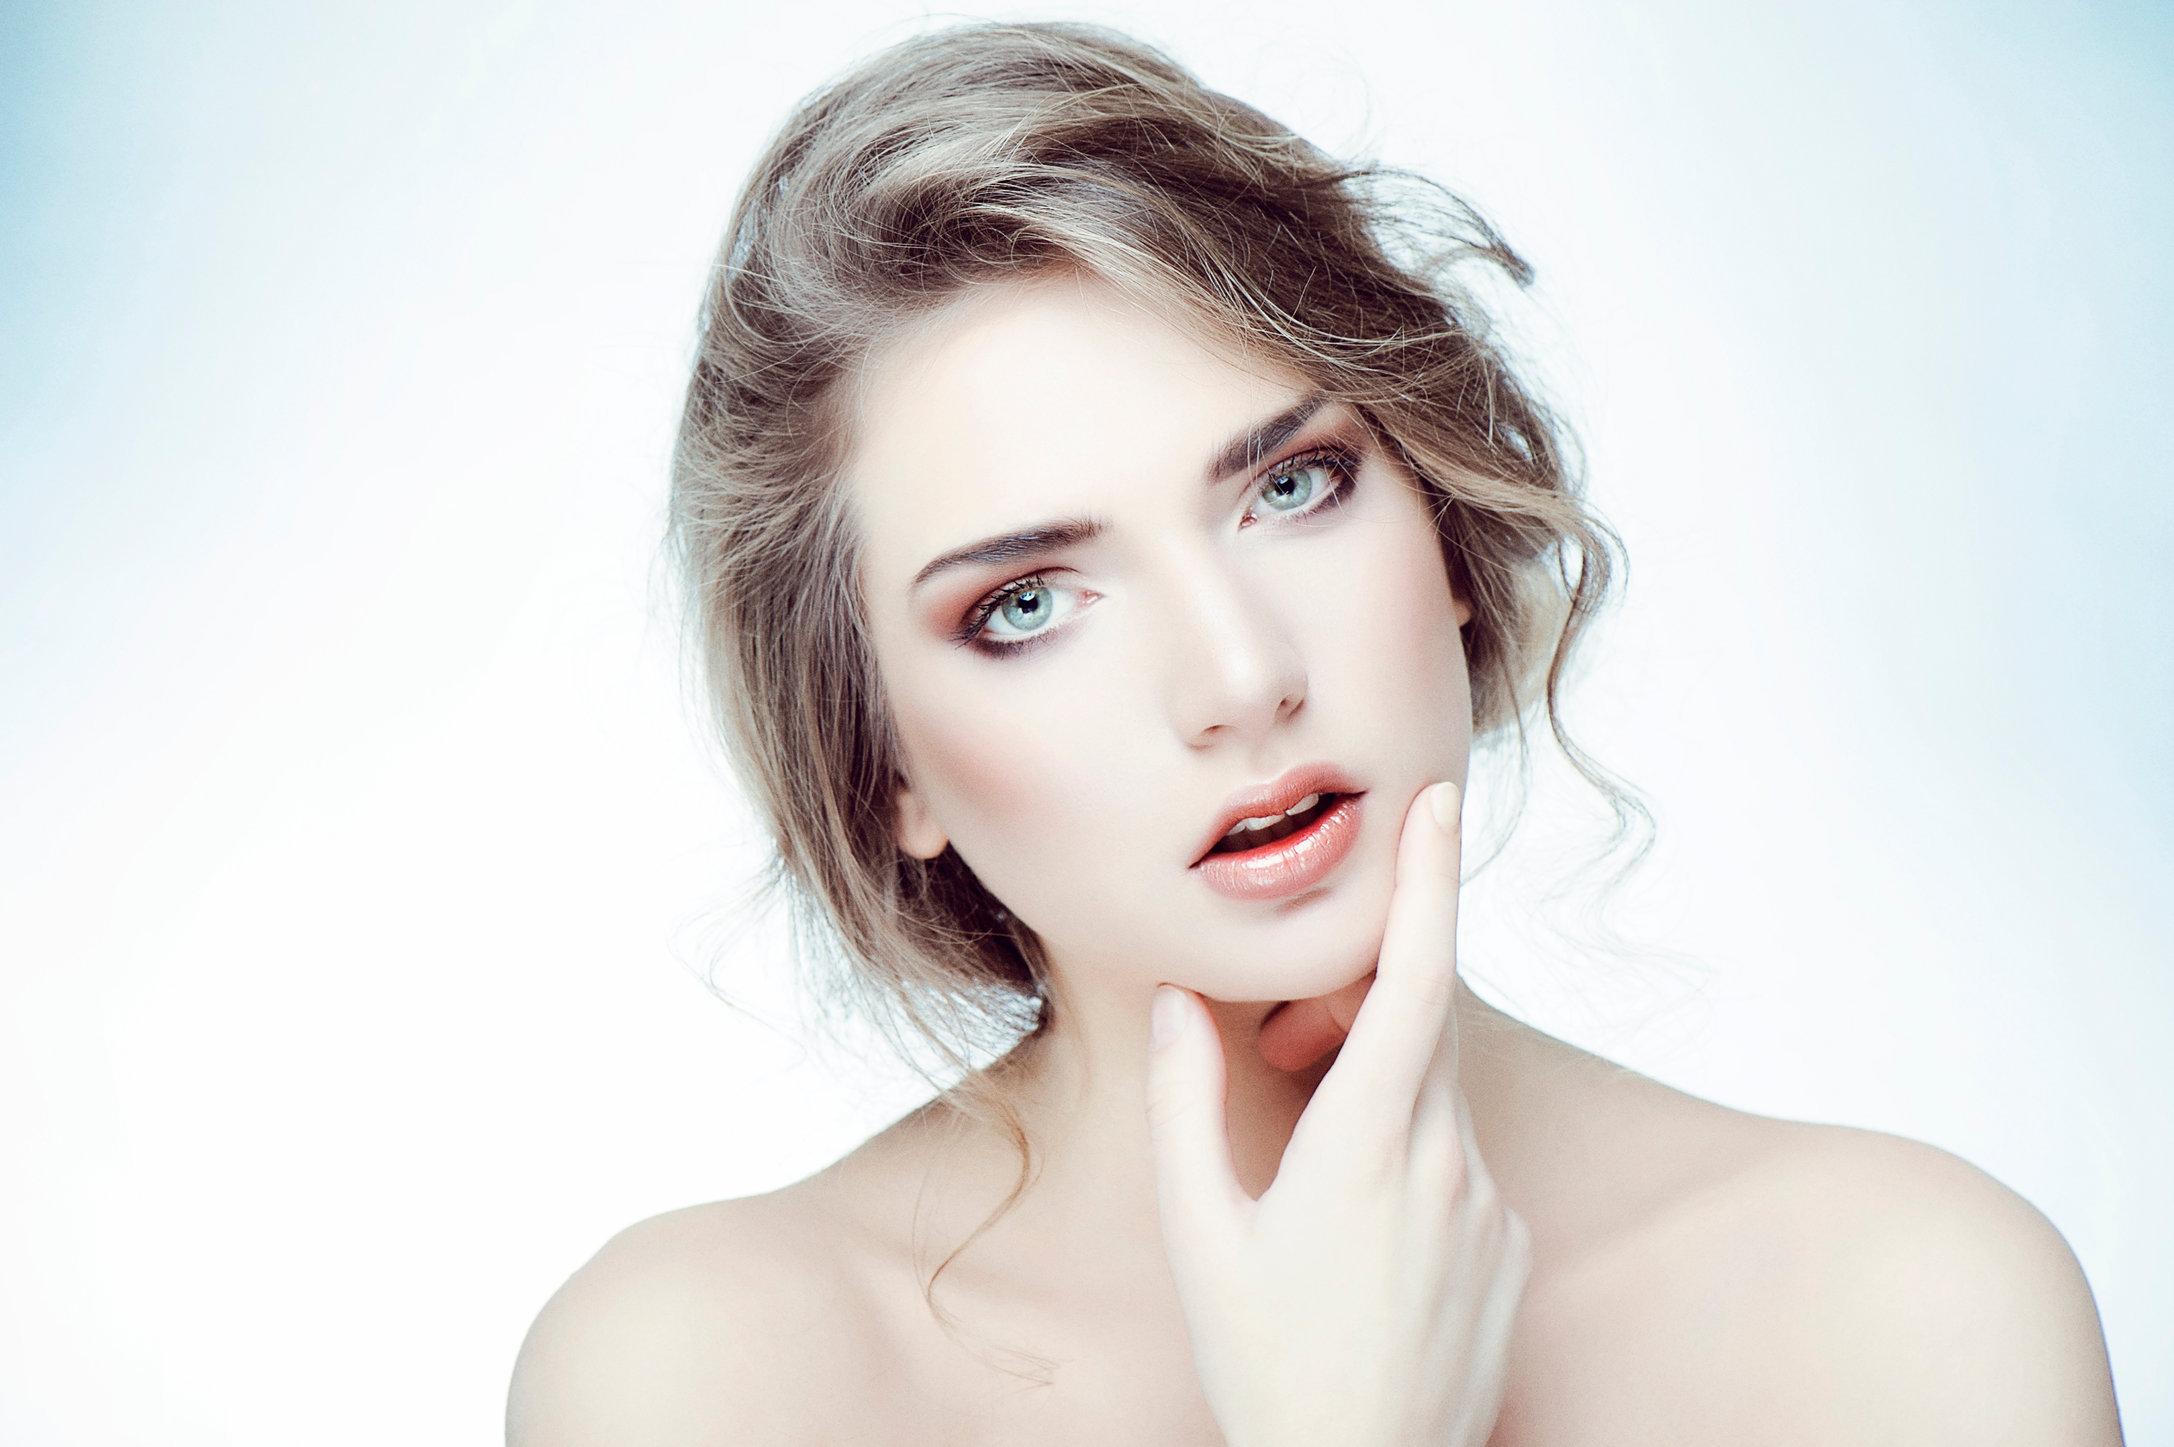 KarolinaAmberville_Beauty_b.jpg